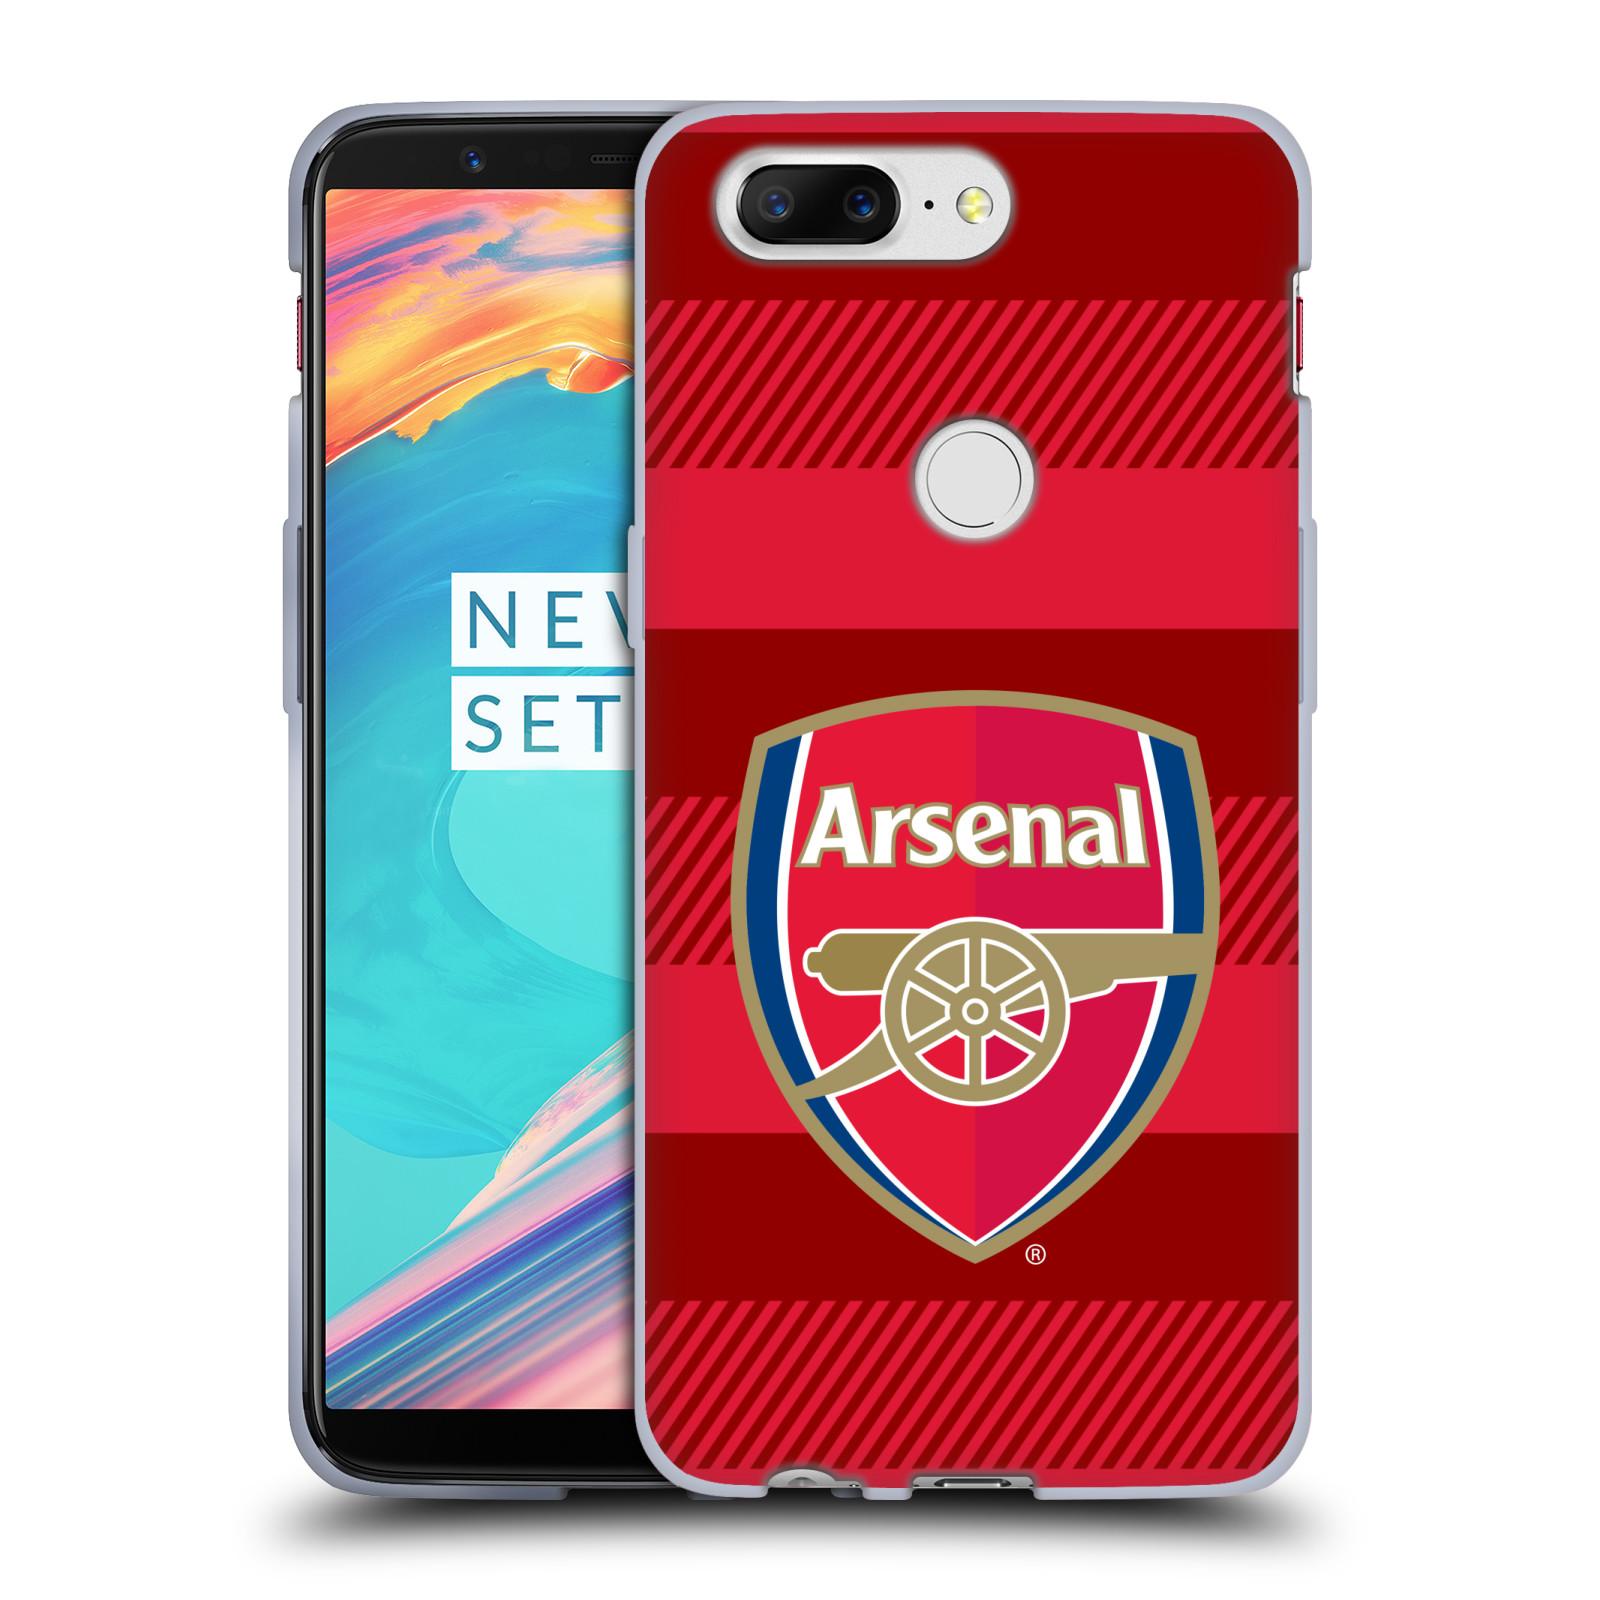 Silikonové pouzdro na mobil OnePlus 5T - Head Case - Arsenal FC - Logo s pruhy